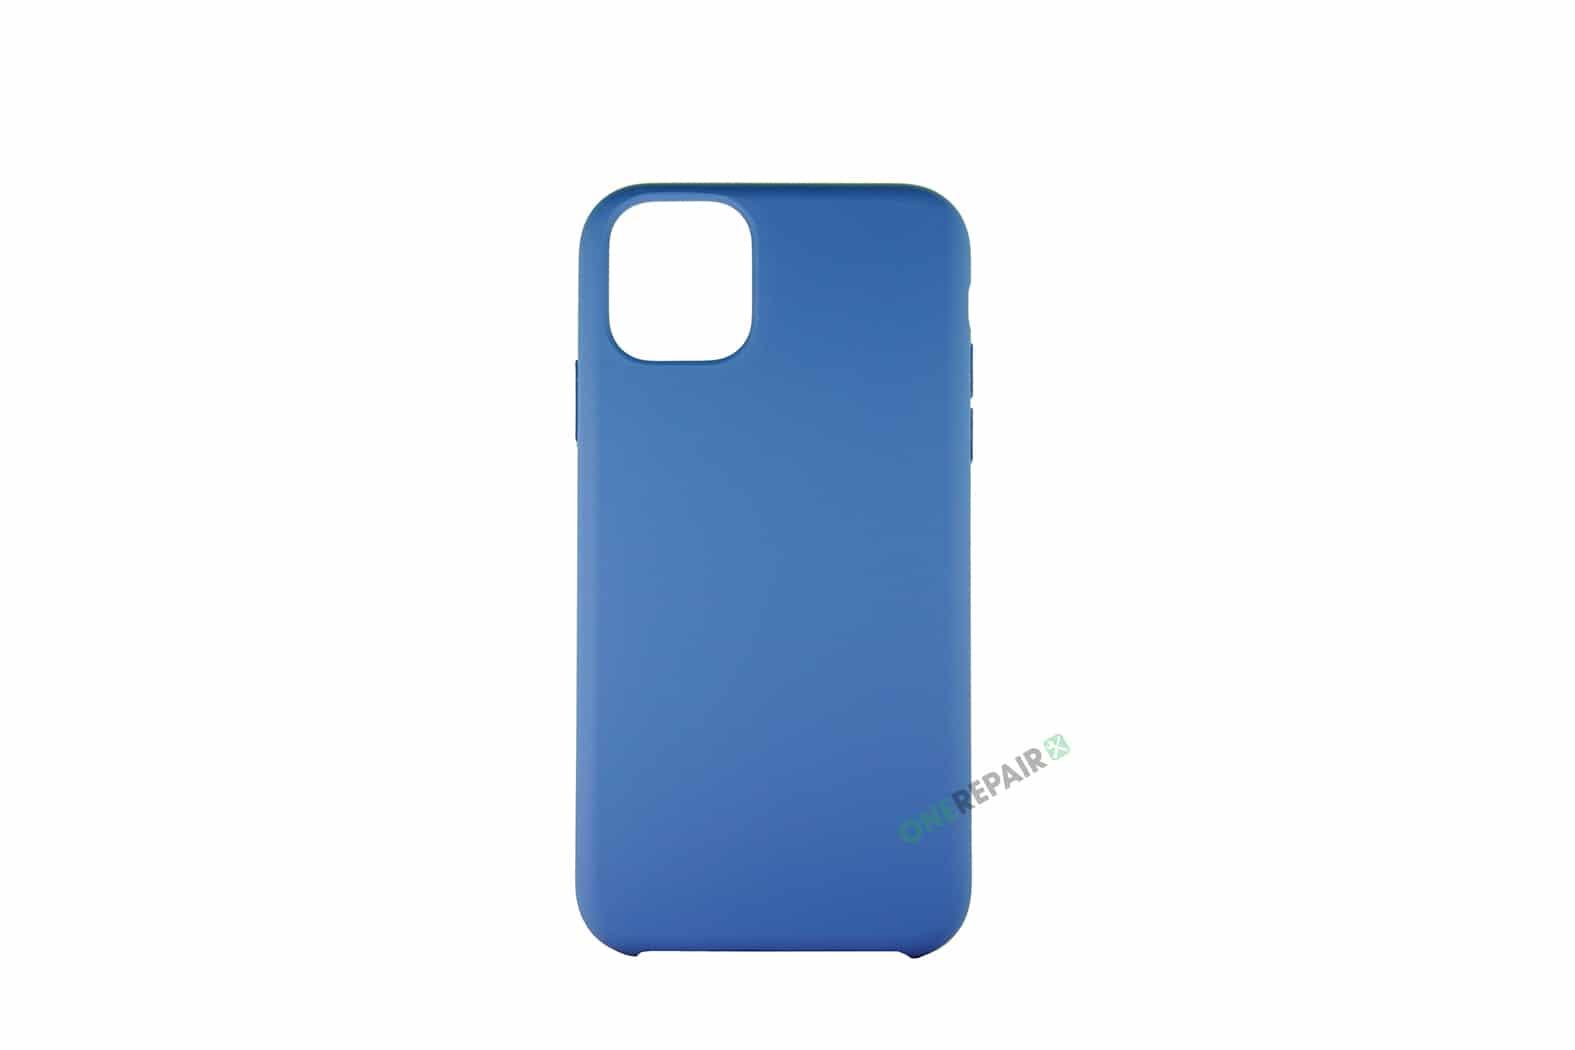 353778-003_iPhone_11_pro_silikone_cover_blaa_OneRepair_00001